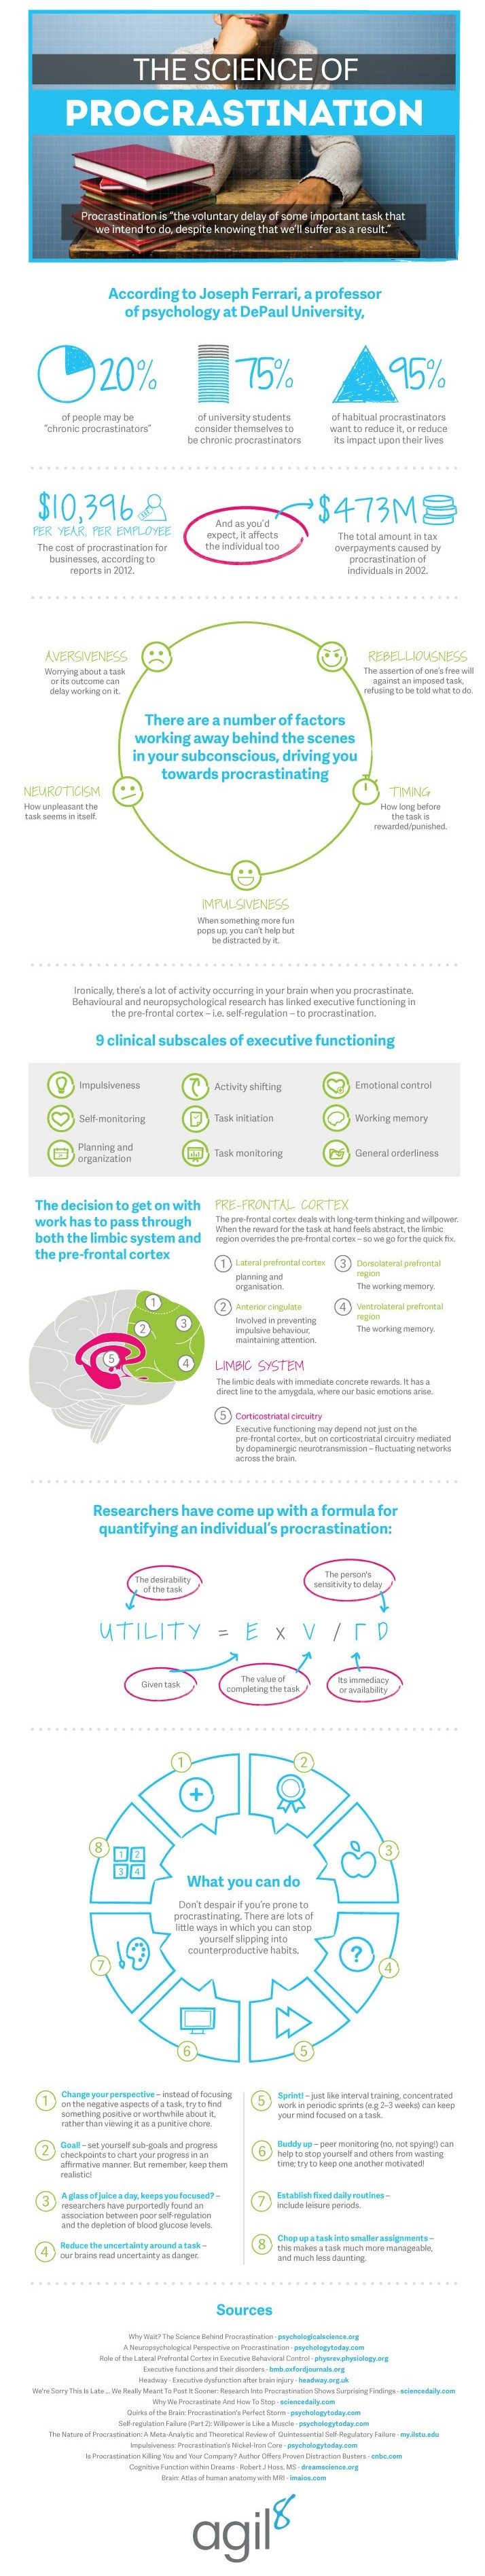 8 Mental Weapons to Vanquish Procrastination (Infographic)